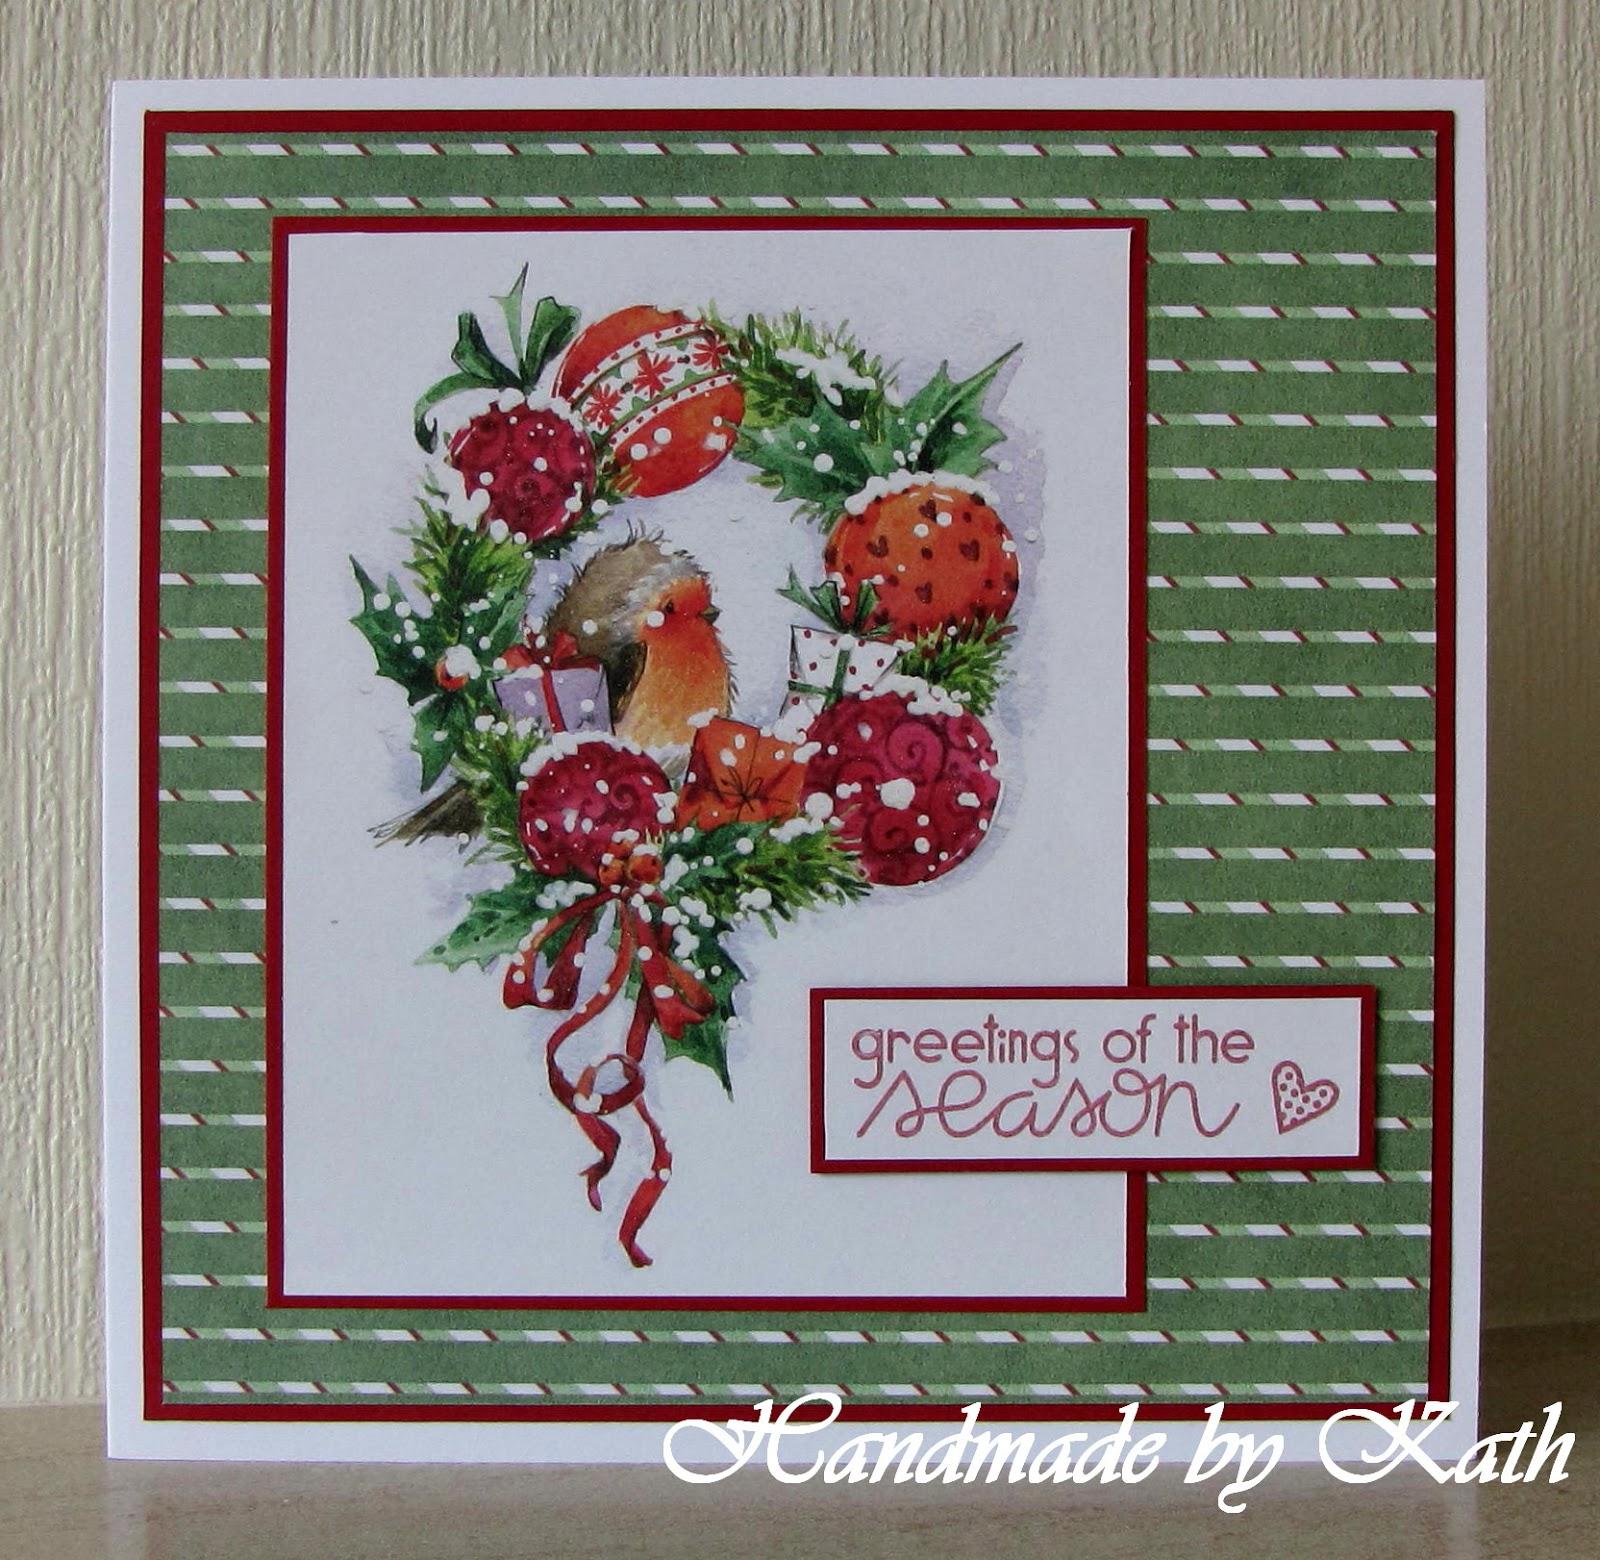 Handmade By Kath Greetings Of The Season